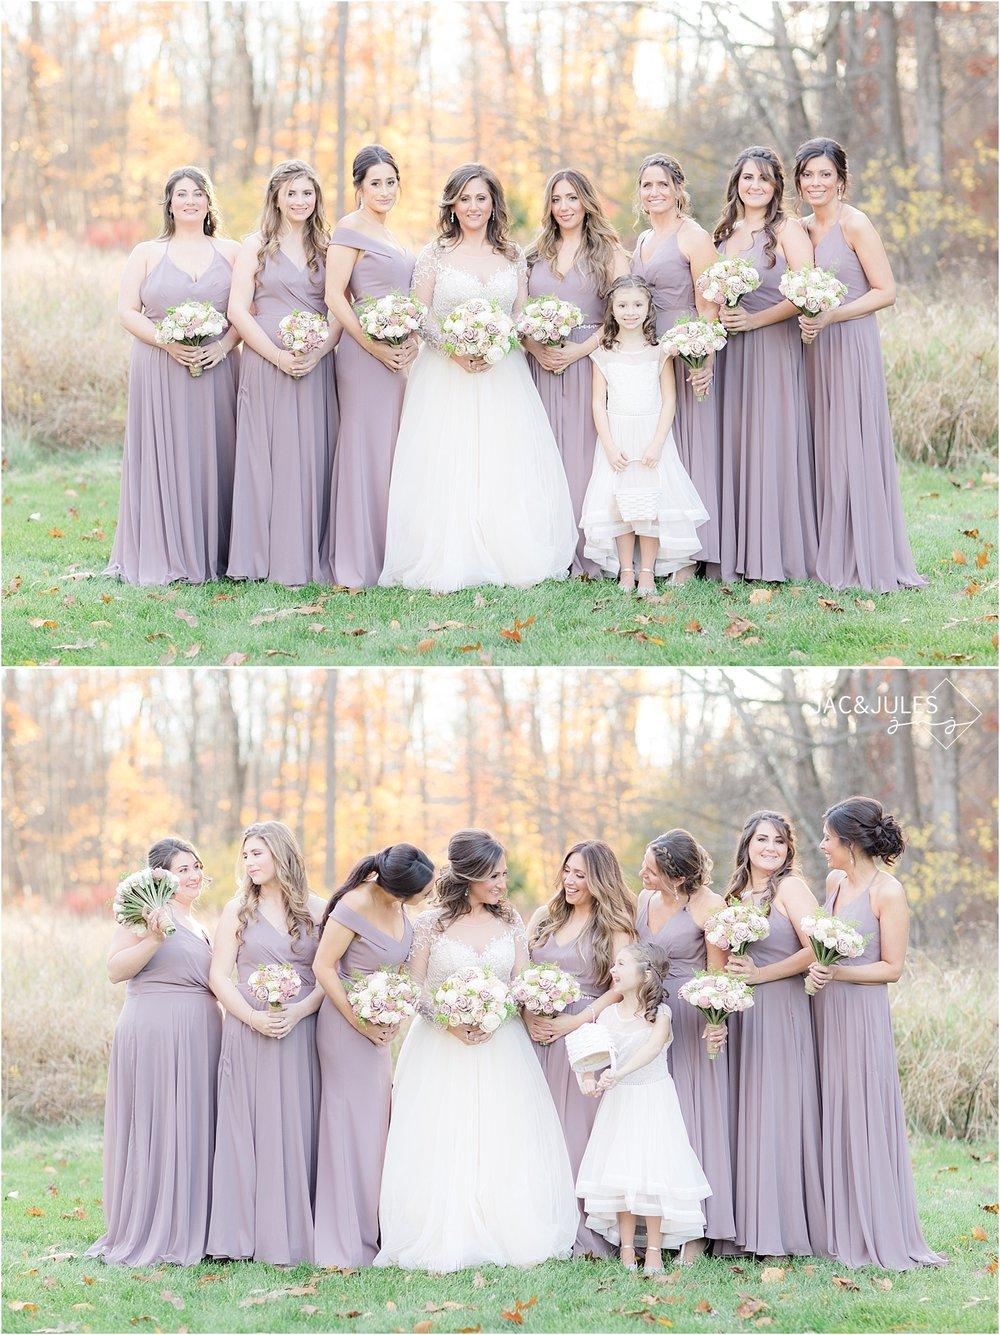 bride and bridesmaids photo in purple dresses at Perona Farms